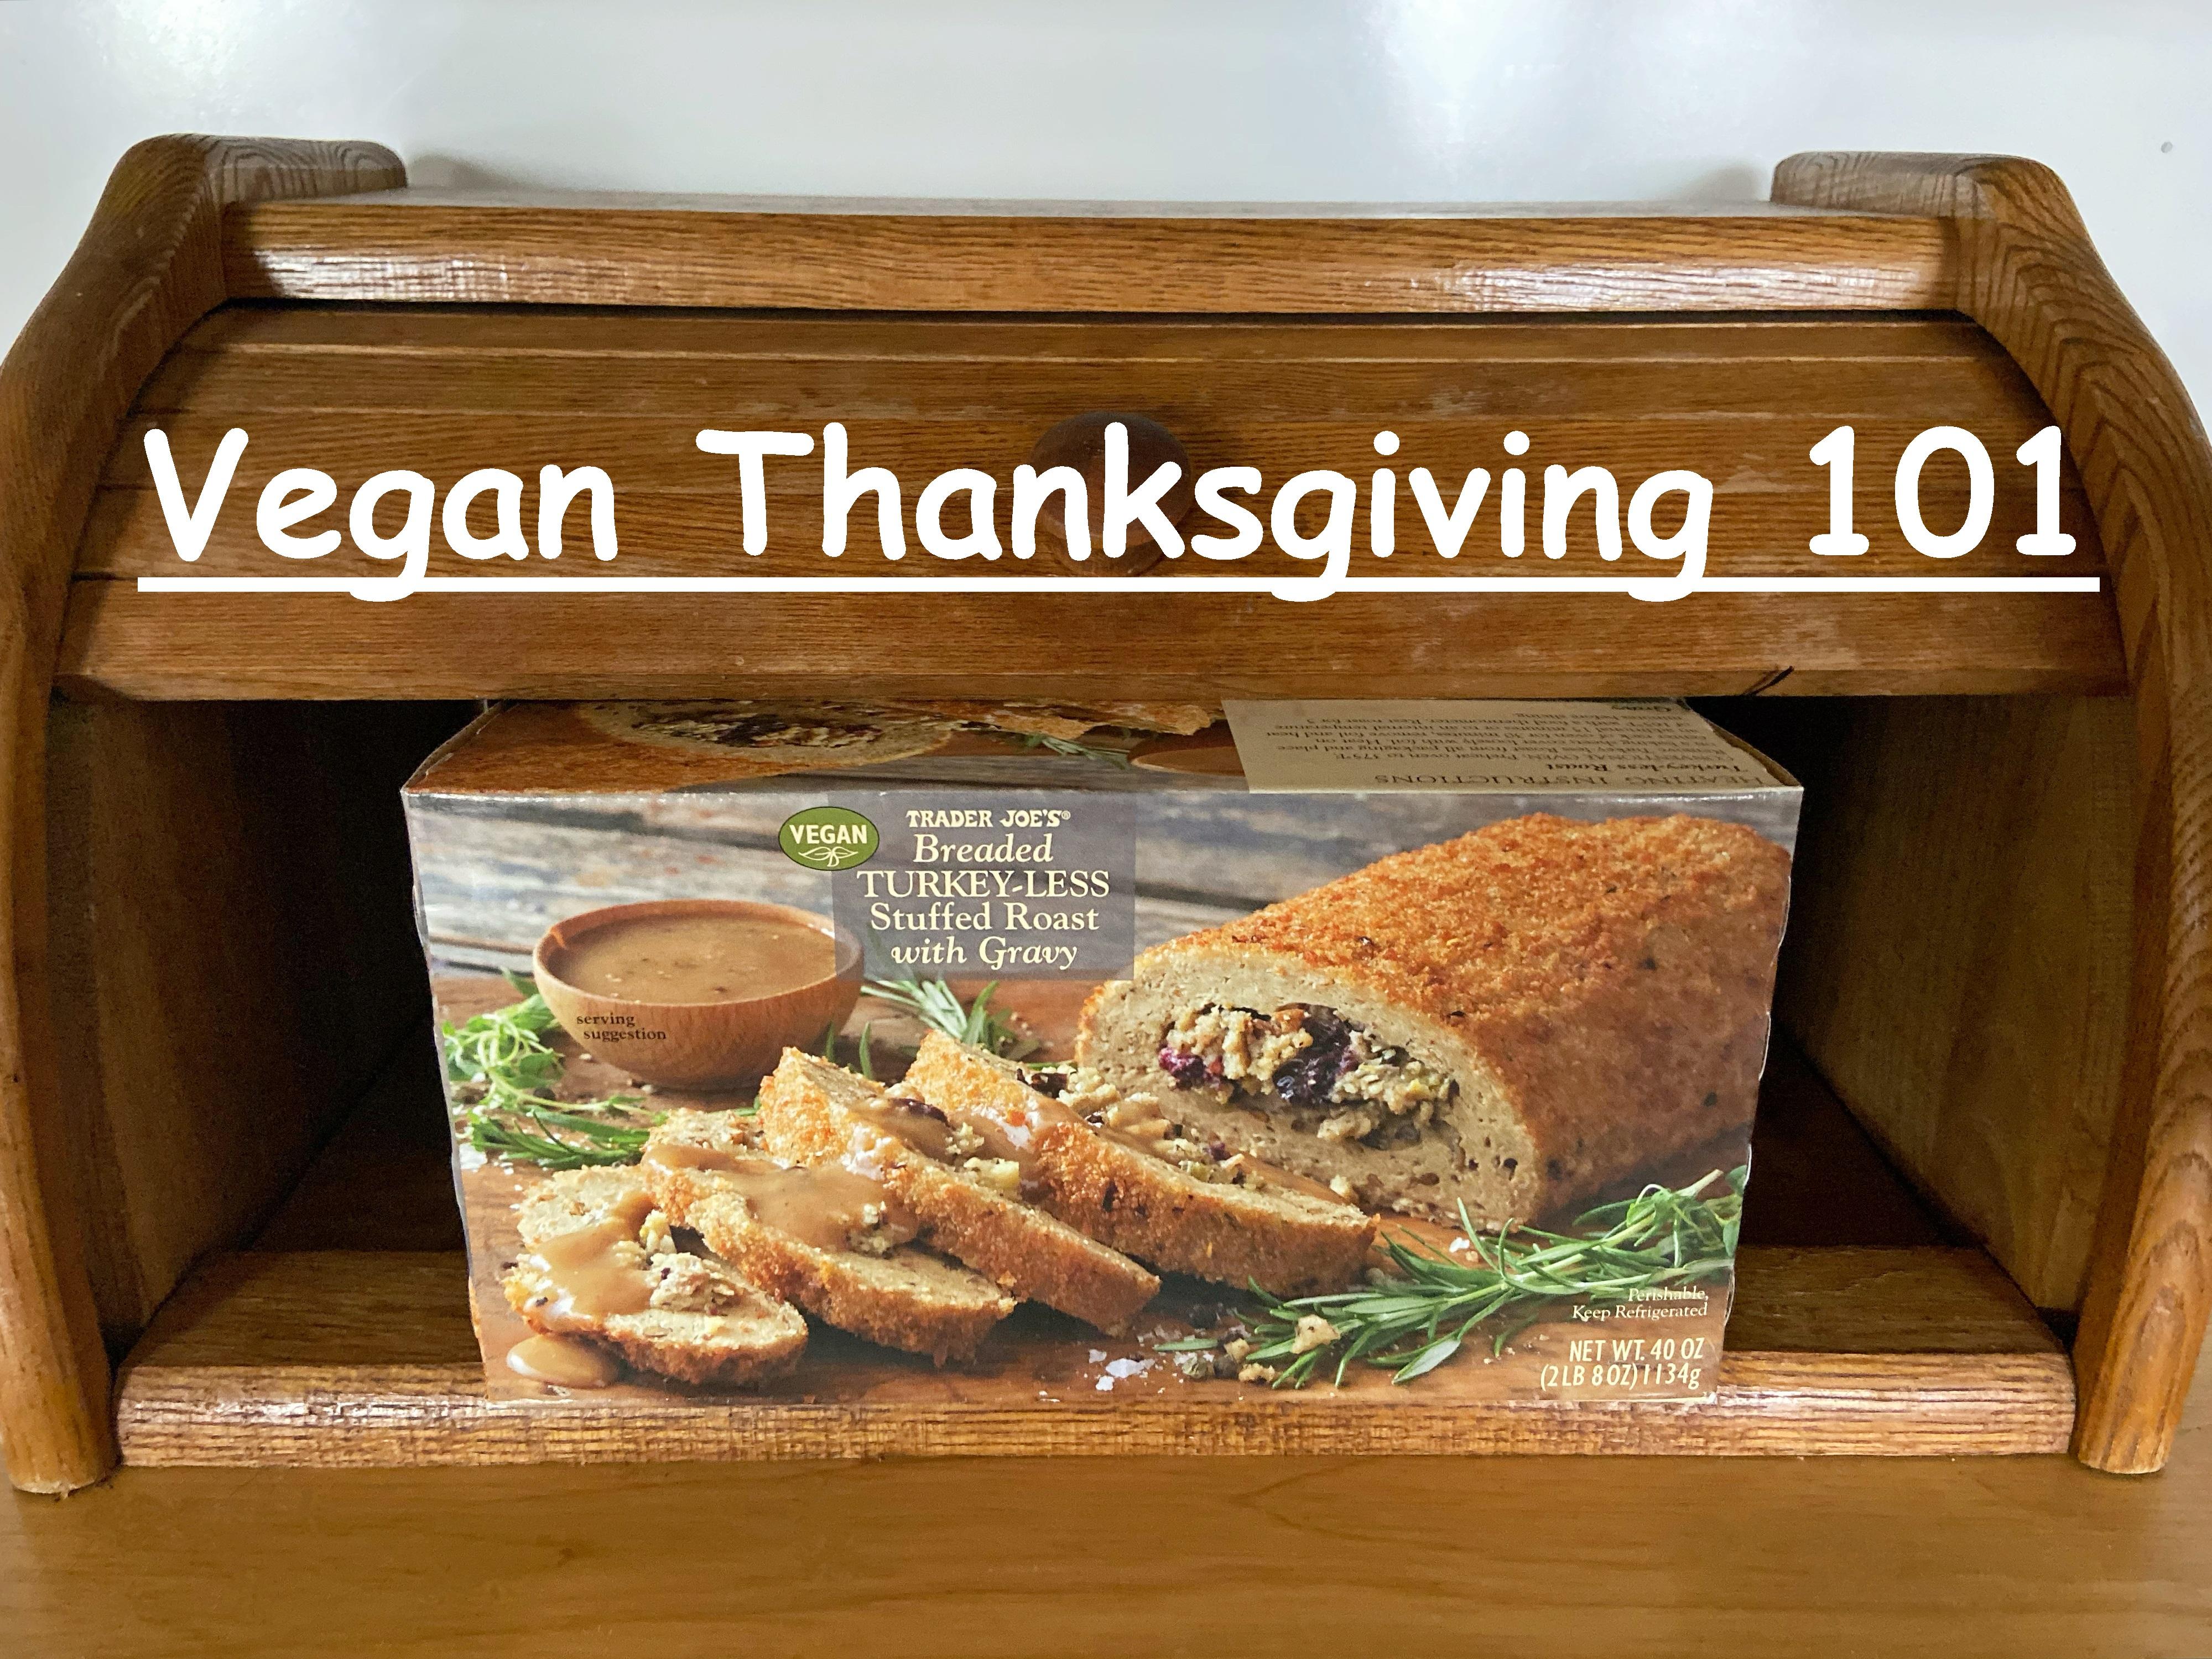 Vegan Thanksgiving, Vegan Thanksgiving 101: Meatless Turkey Options, The Travel Bug Bite